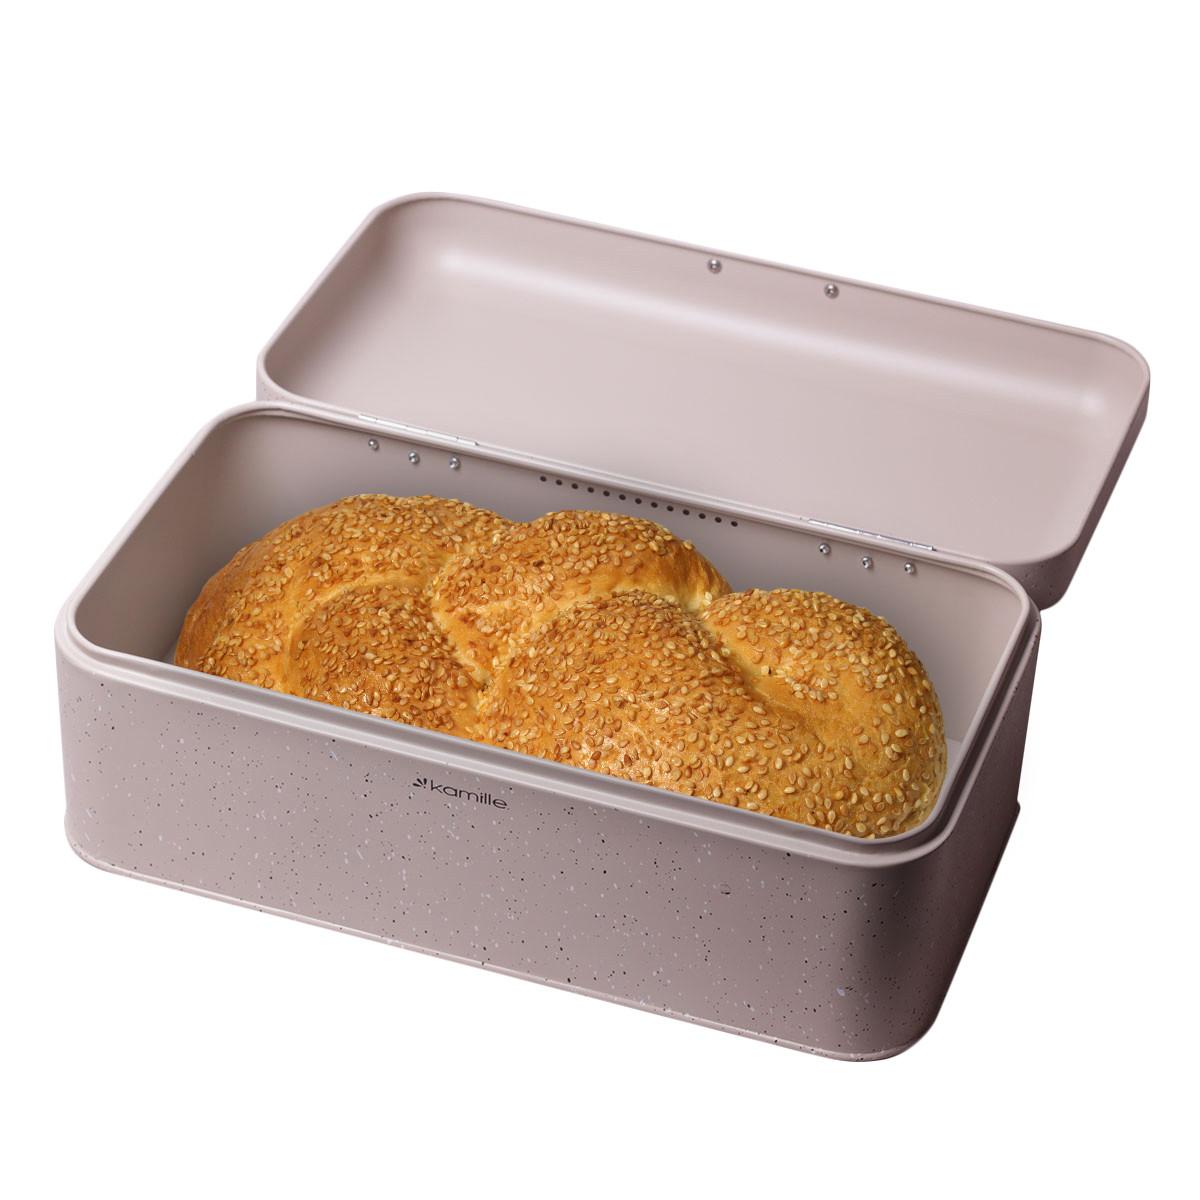 Хлебница Kamille 42*23.5*16.5см из нержавеющей стали  KM-1108